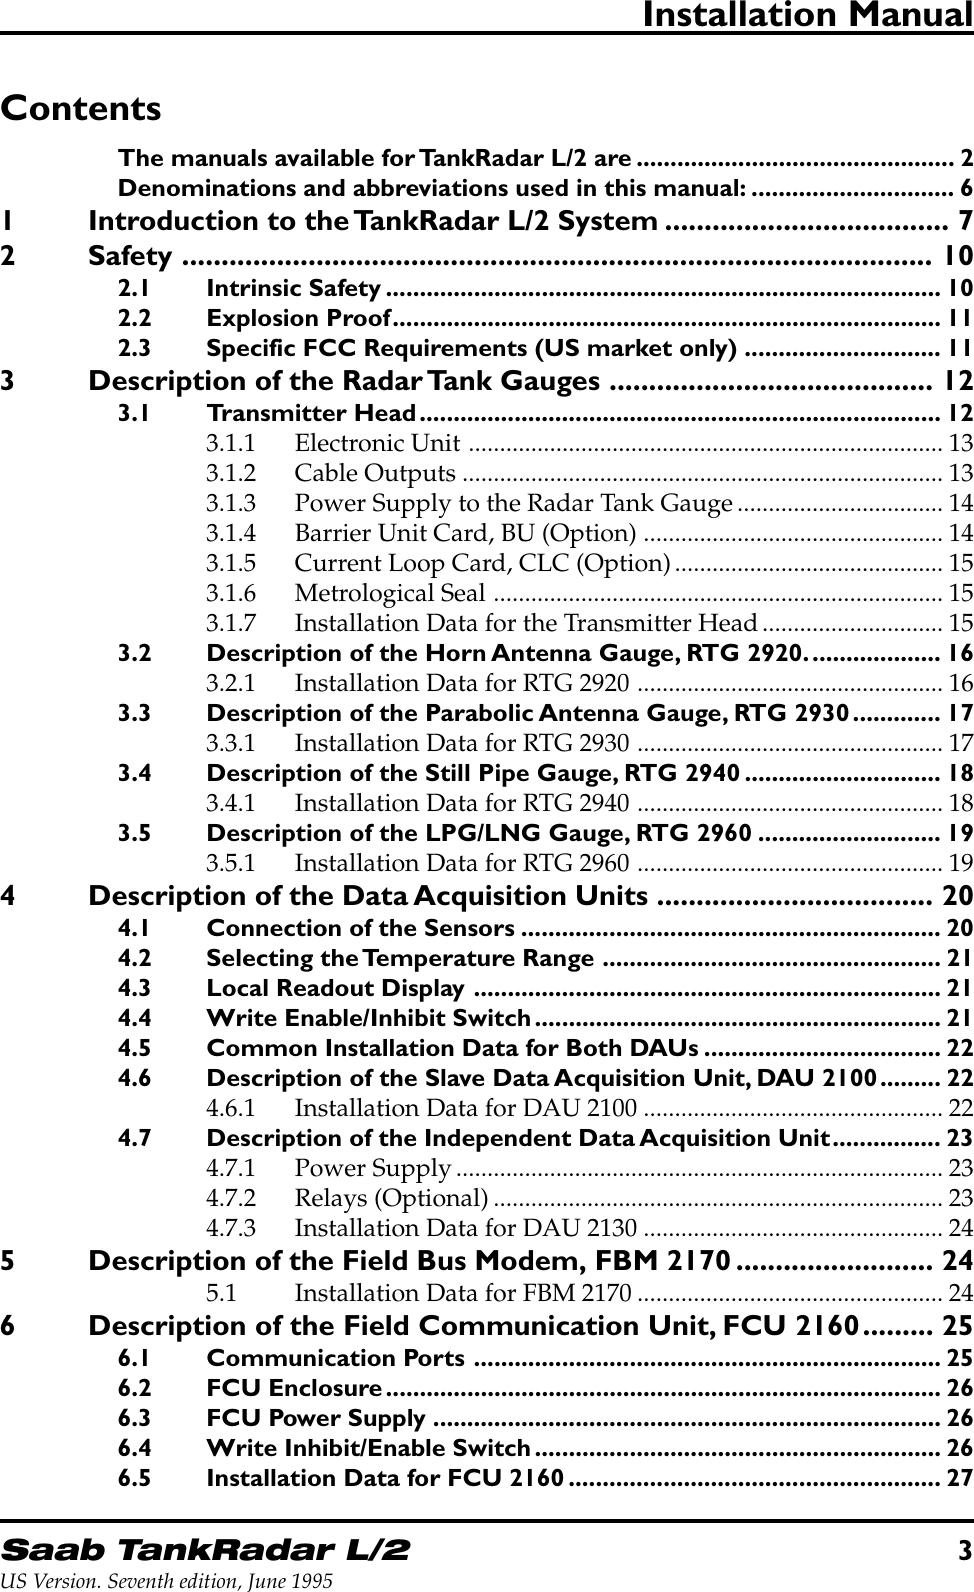 Fbm 214 Manual Nat G Cooling Fan Wiring Diagram on